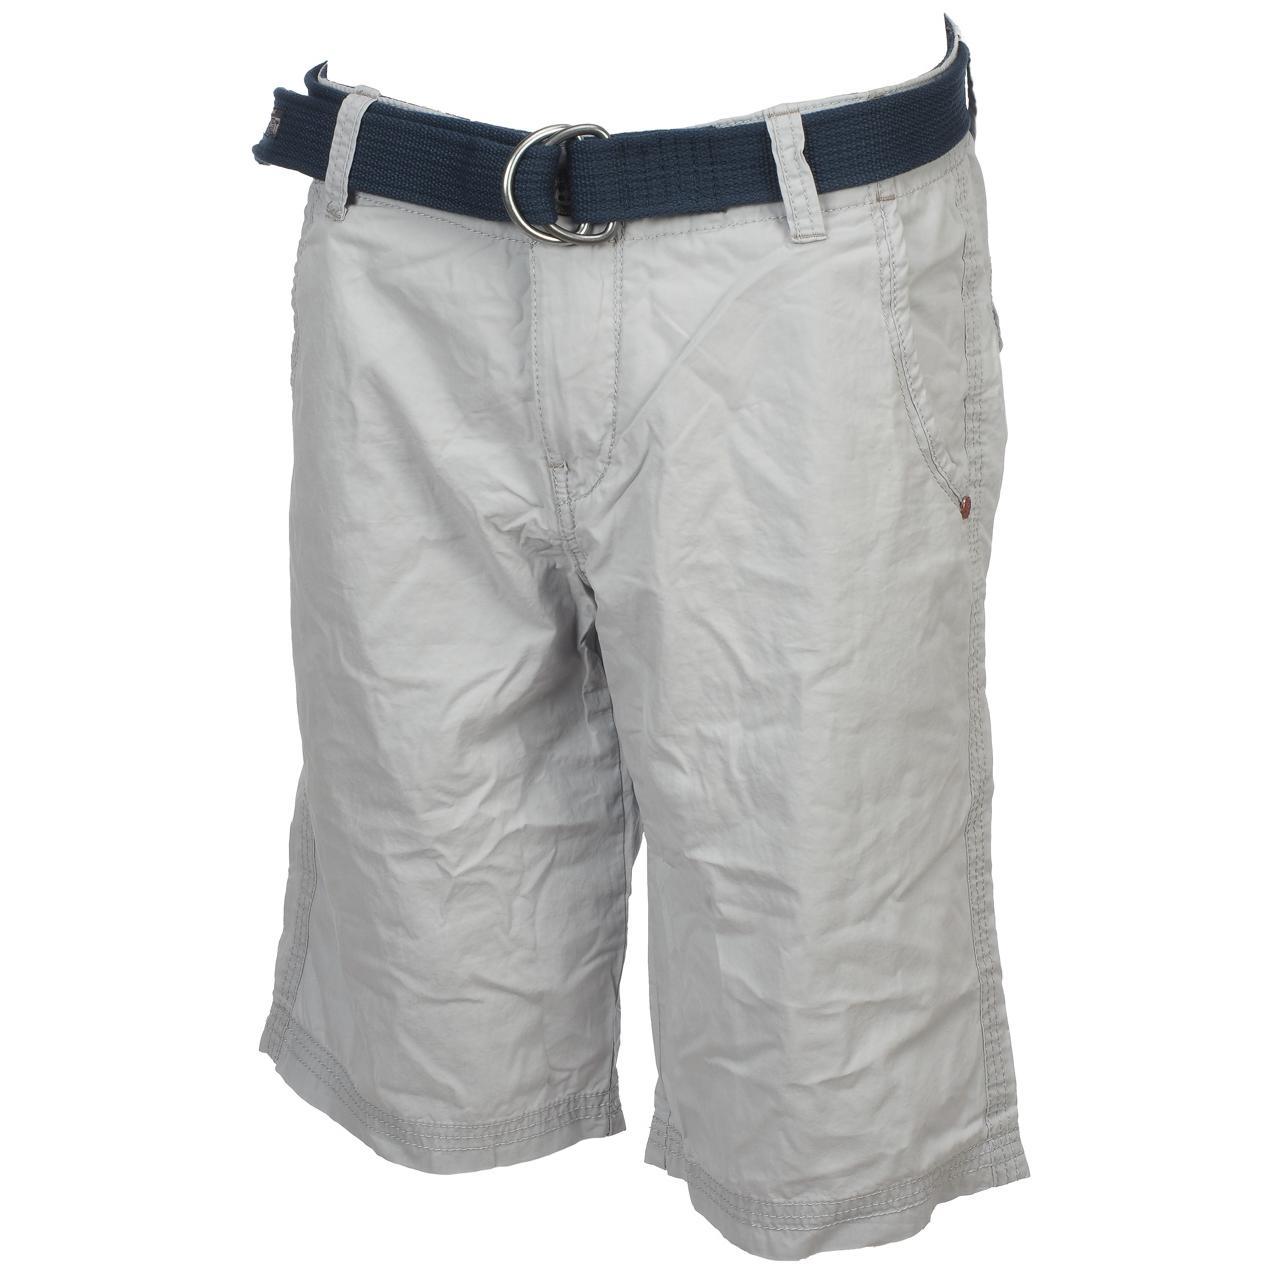 Bermuda-Shorts-Timezone-Russell-Light-Grey-Shorts-Grey-42181-New